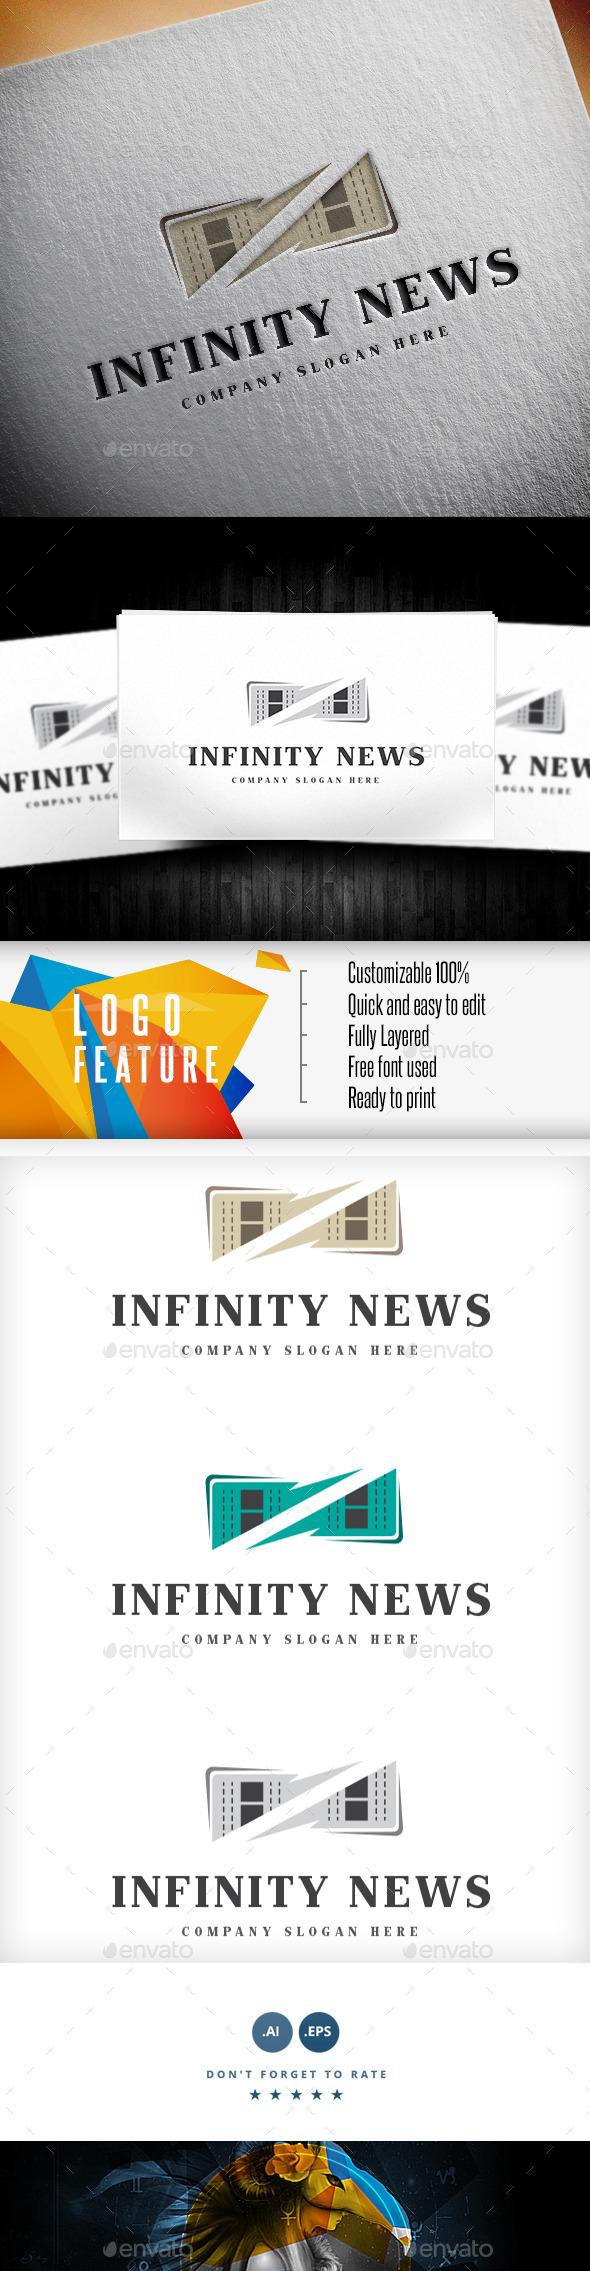 Infinity News Logo - Logo Templates